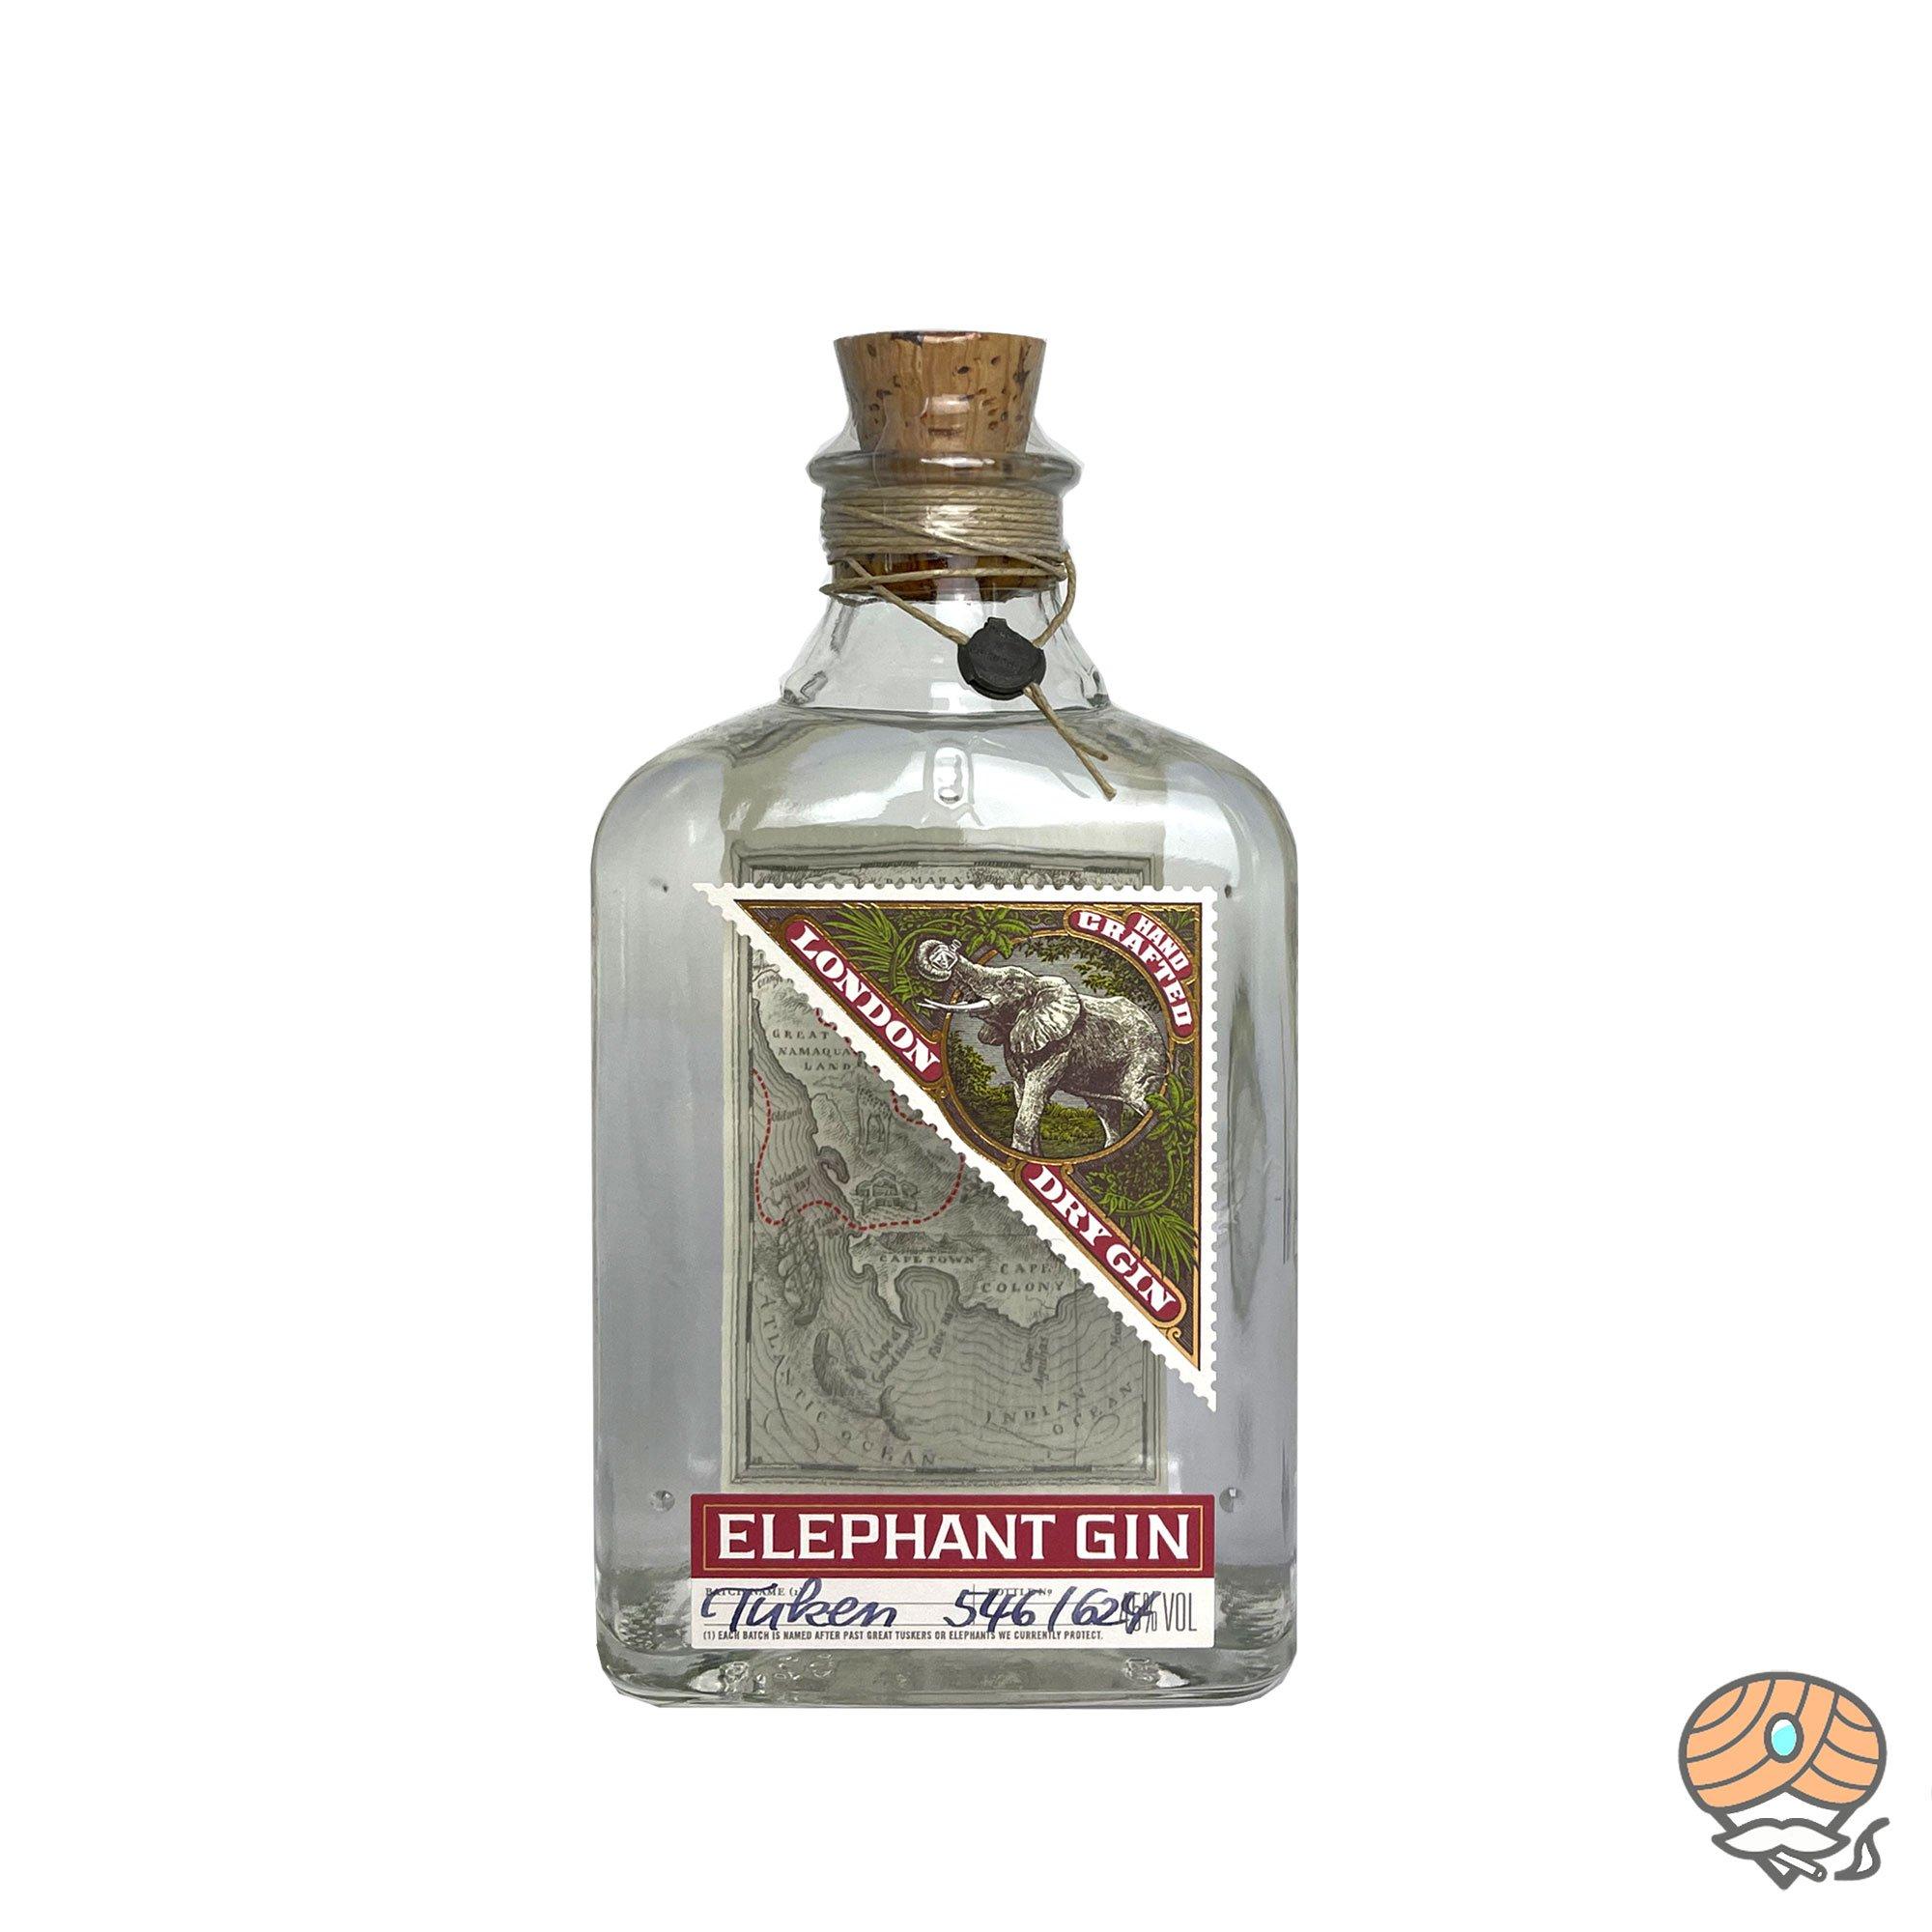 Elephant Handcrafted London Dry Gin Inhalt 500ml, 45% Vol alc.